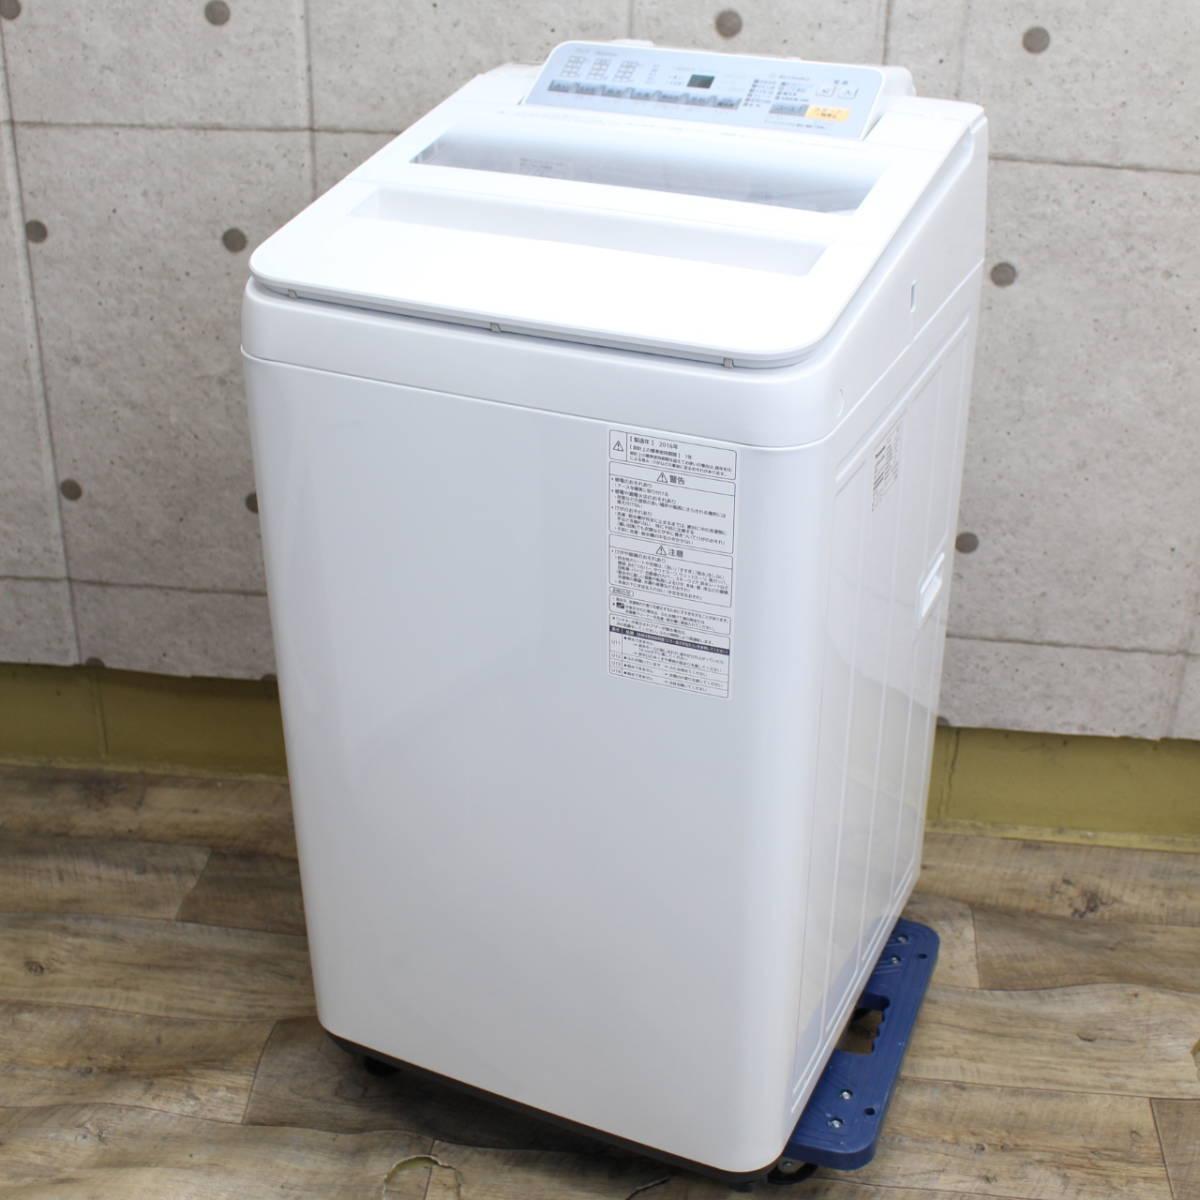 R060)パナソニック Panasonic 全自動洗濯機 NA-FA70H3 2016年製 7kg エコナビ 泡洗浄